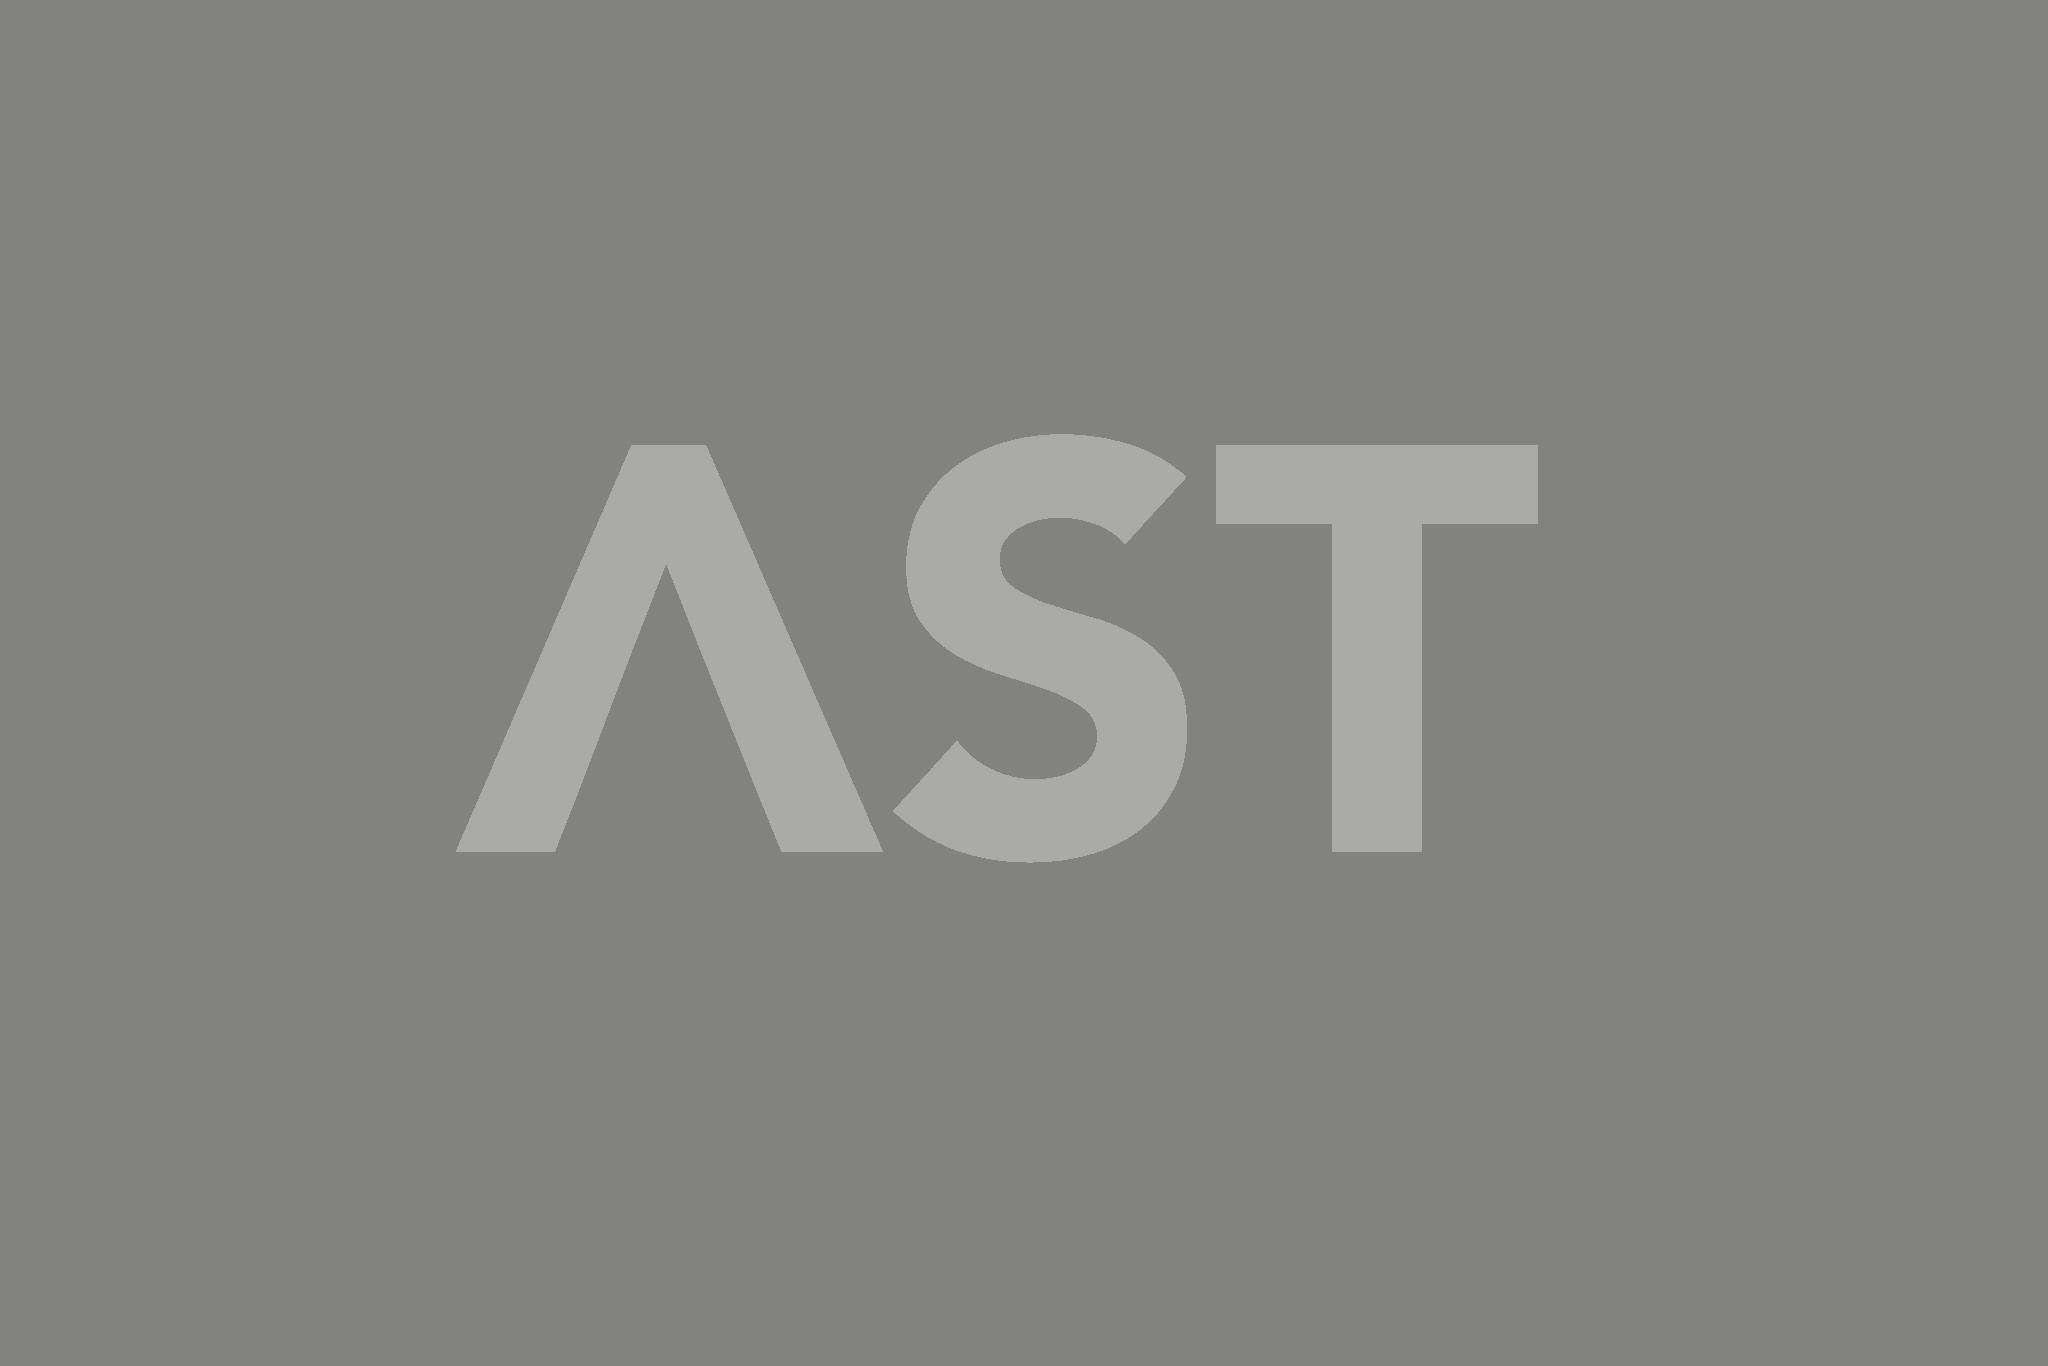 ast-logo2